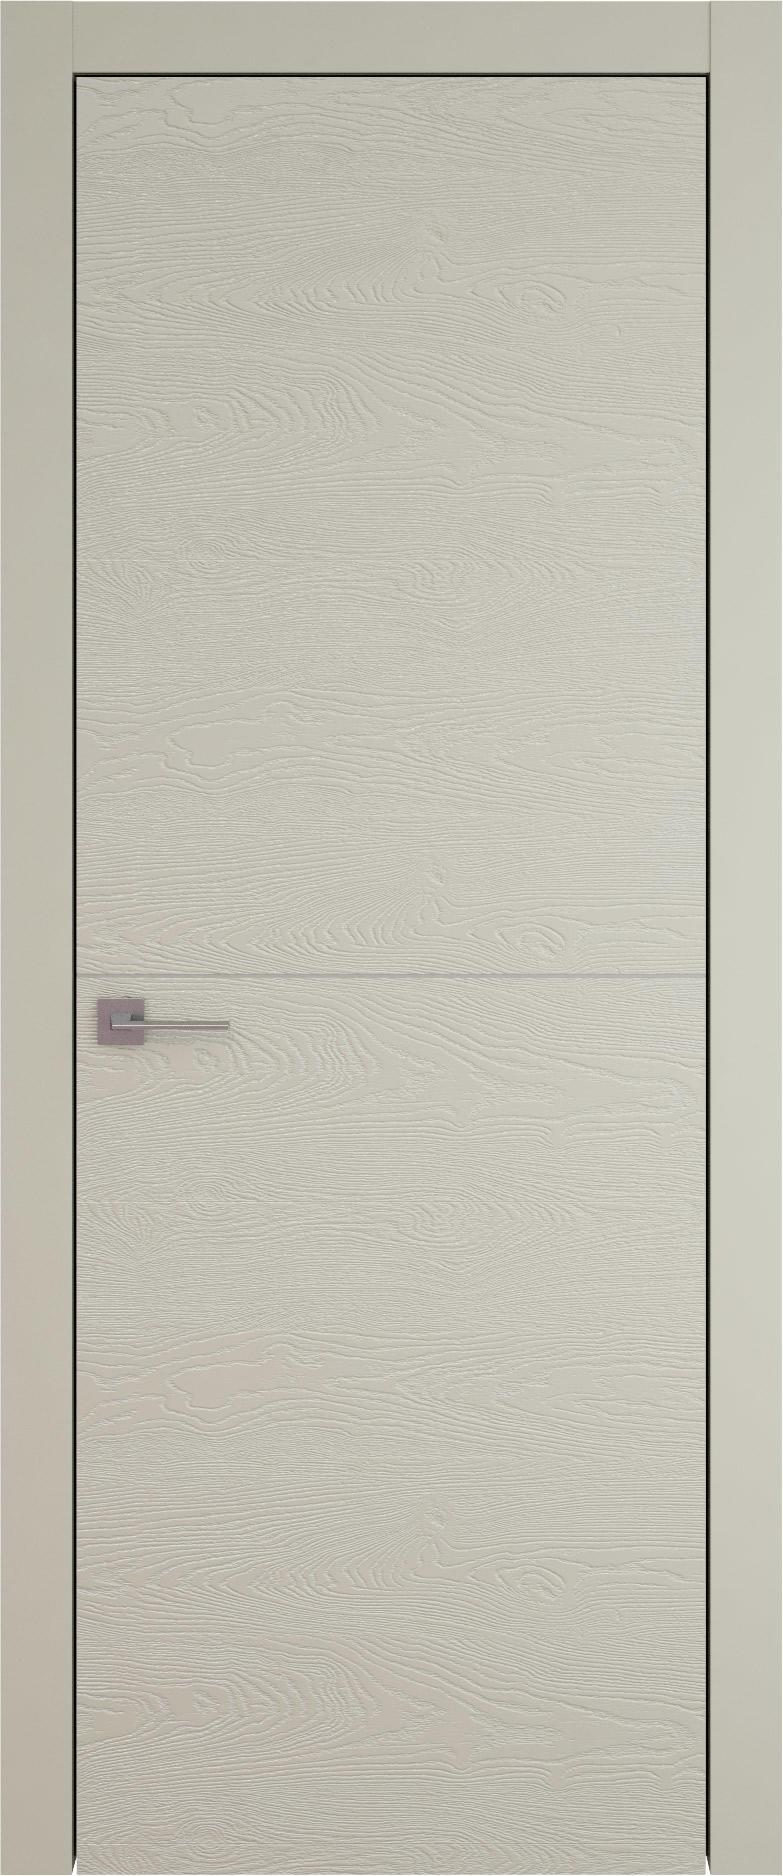 Tivoli Б-3 цвет - Серо-оливковая эмаль по шпону (RAL 7032) Без стекла (ДГ)